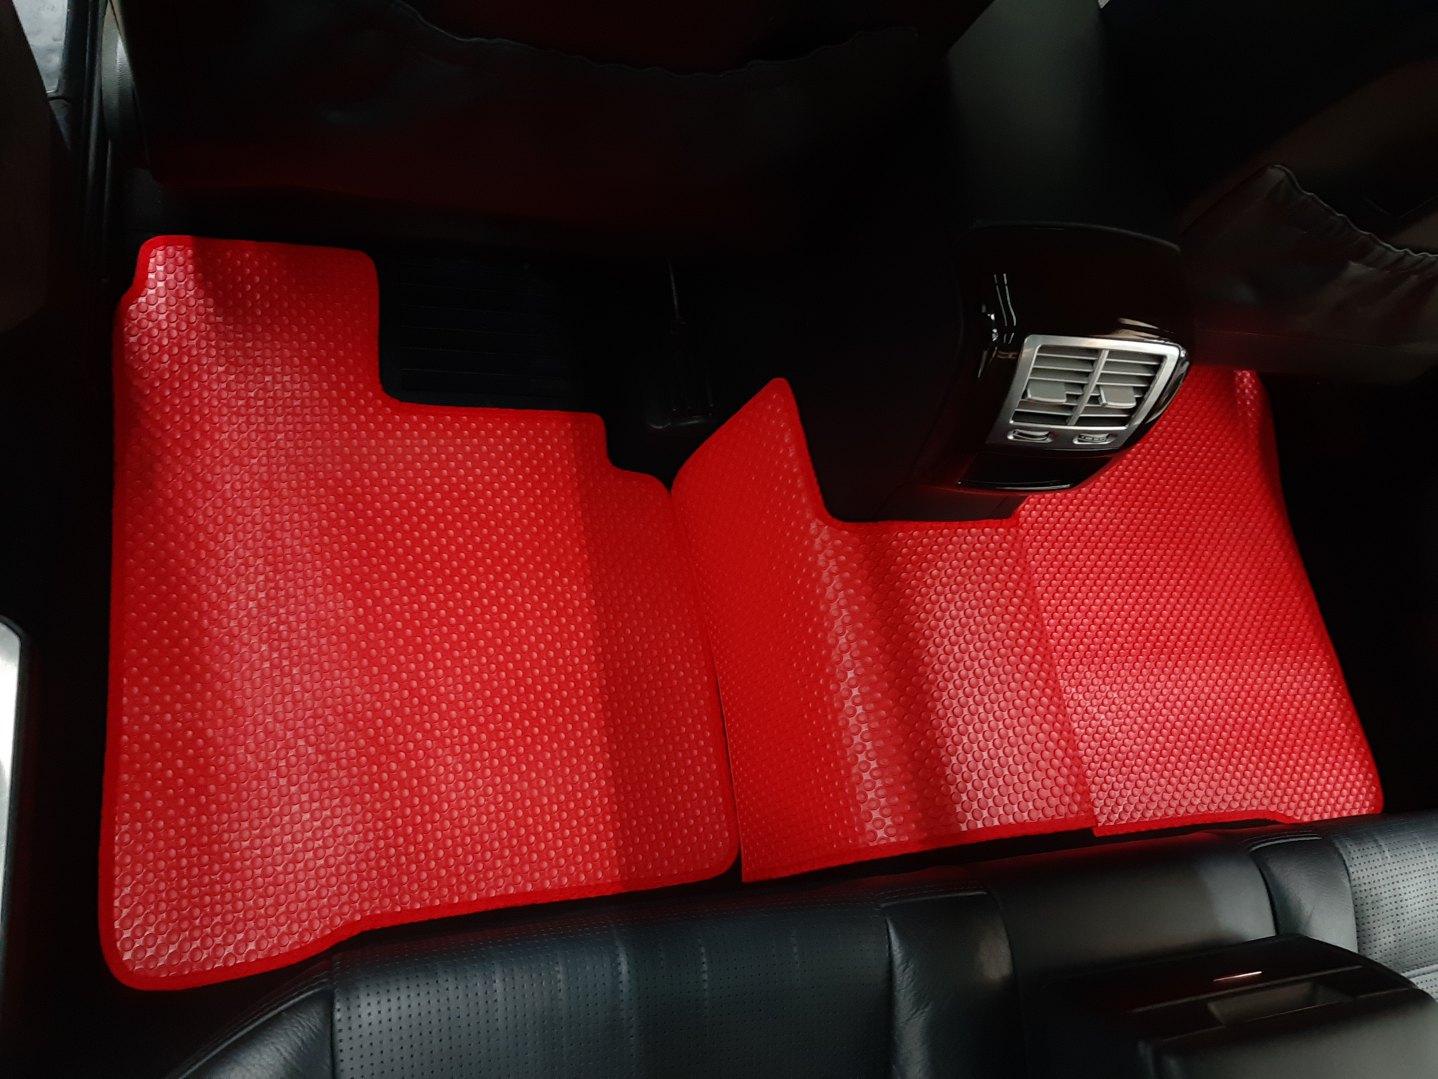 Thảm lót sàn Mercedes S Class W221